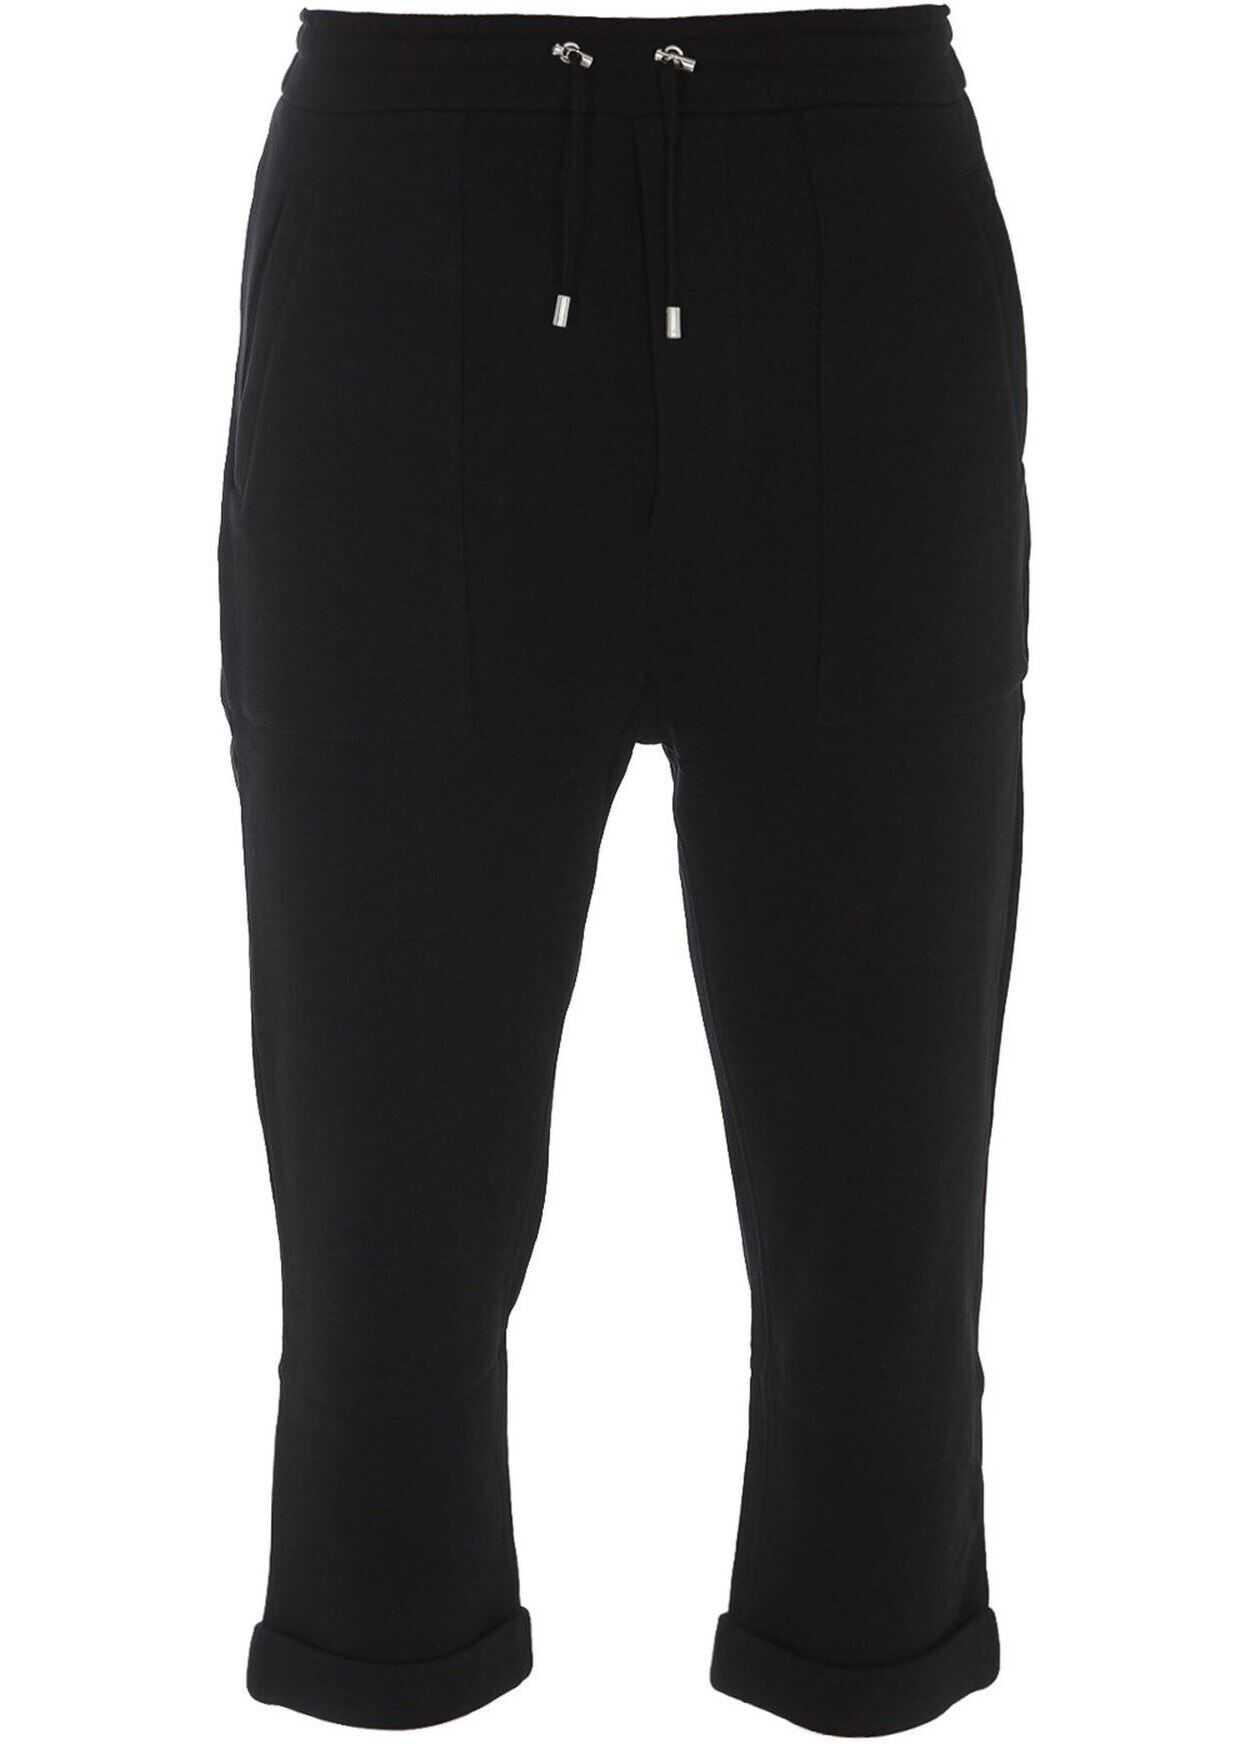 Balmain Cropped Tracksuit Pants In Black Black imagine